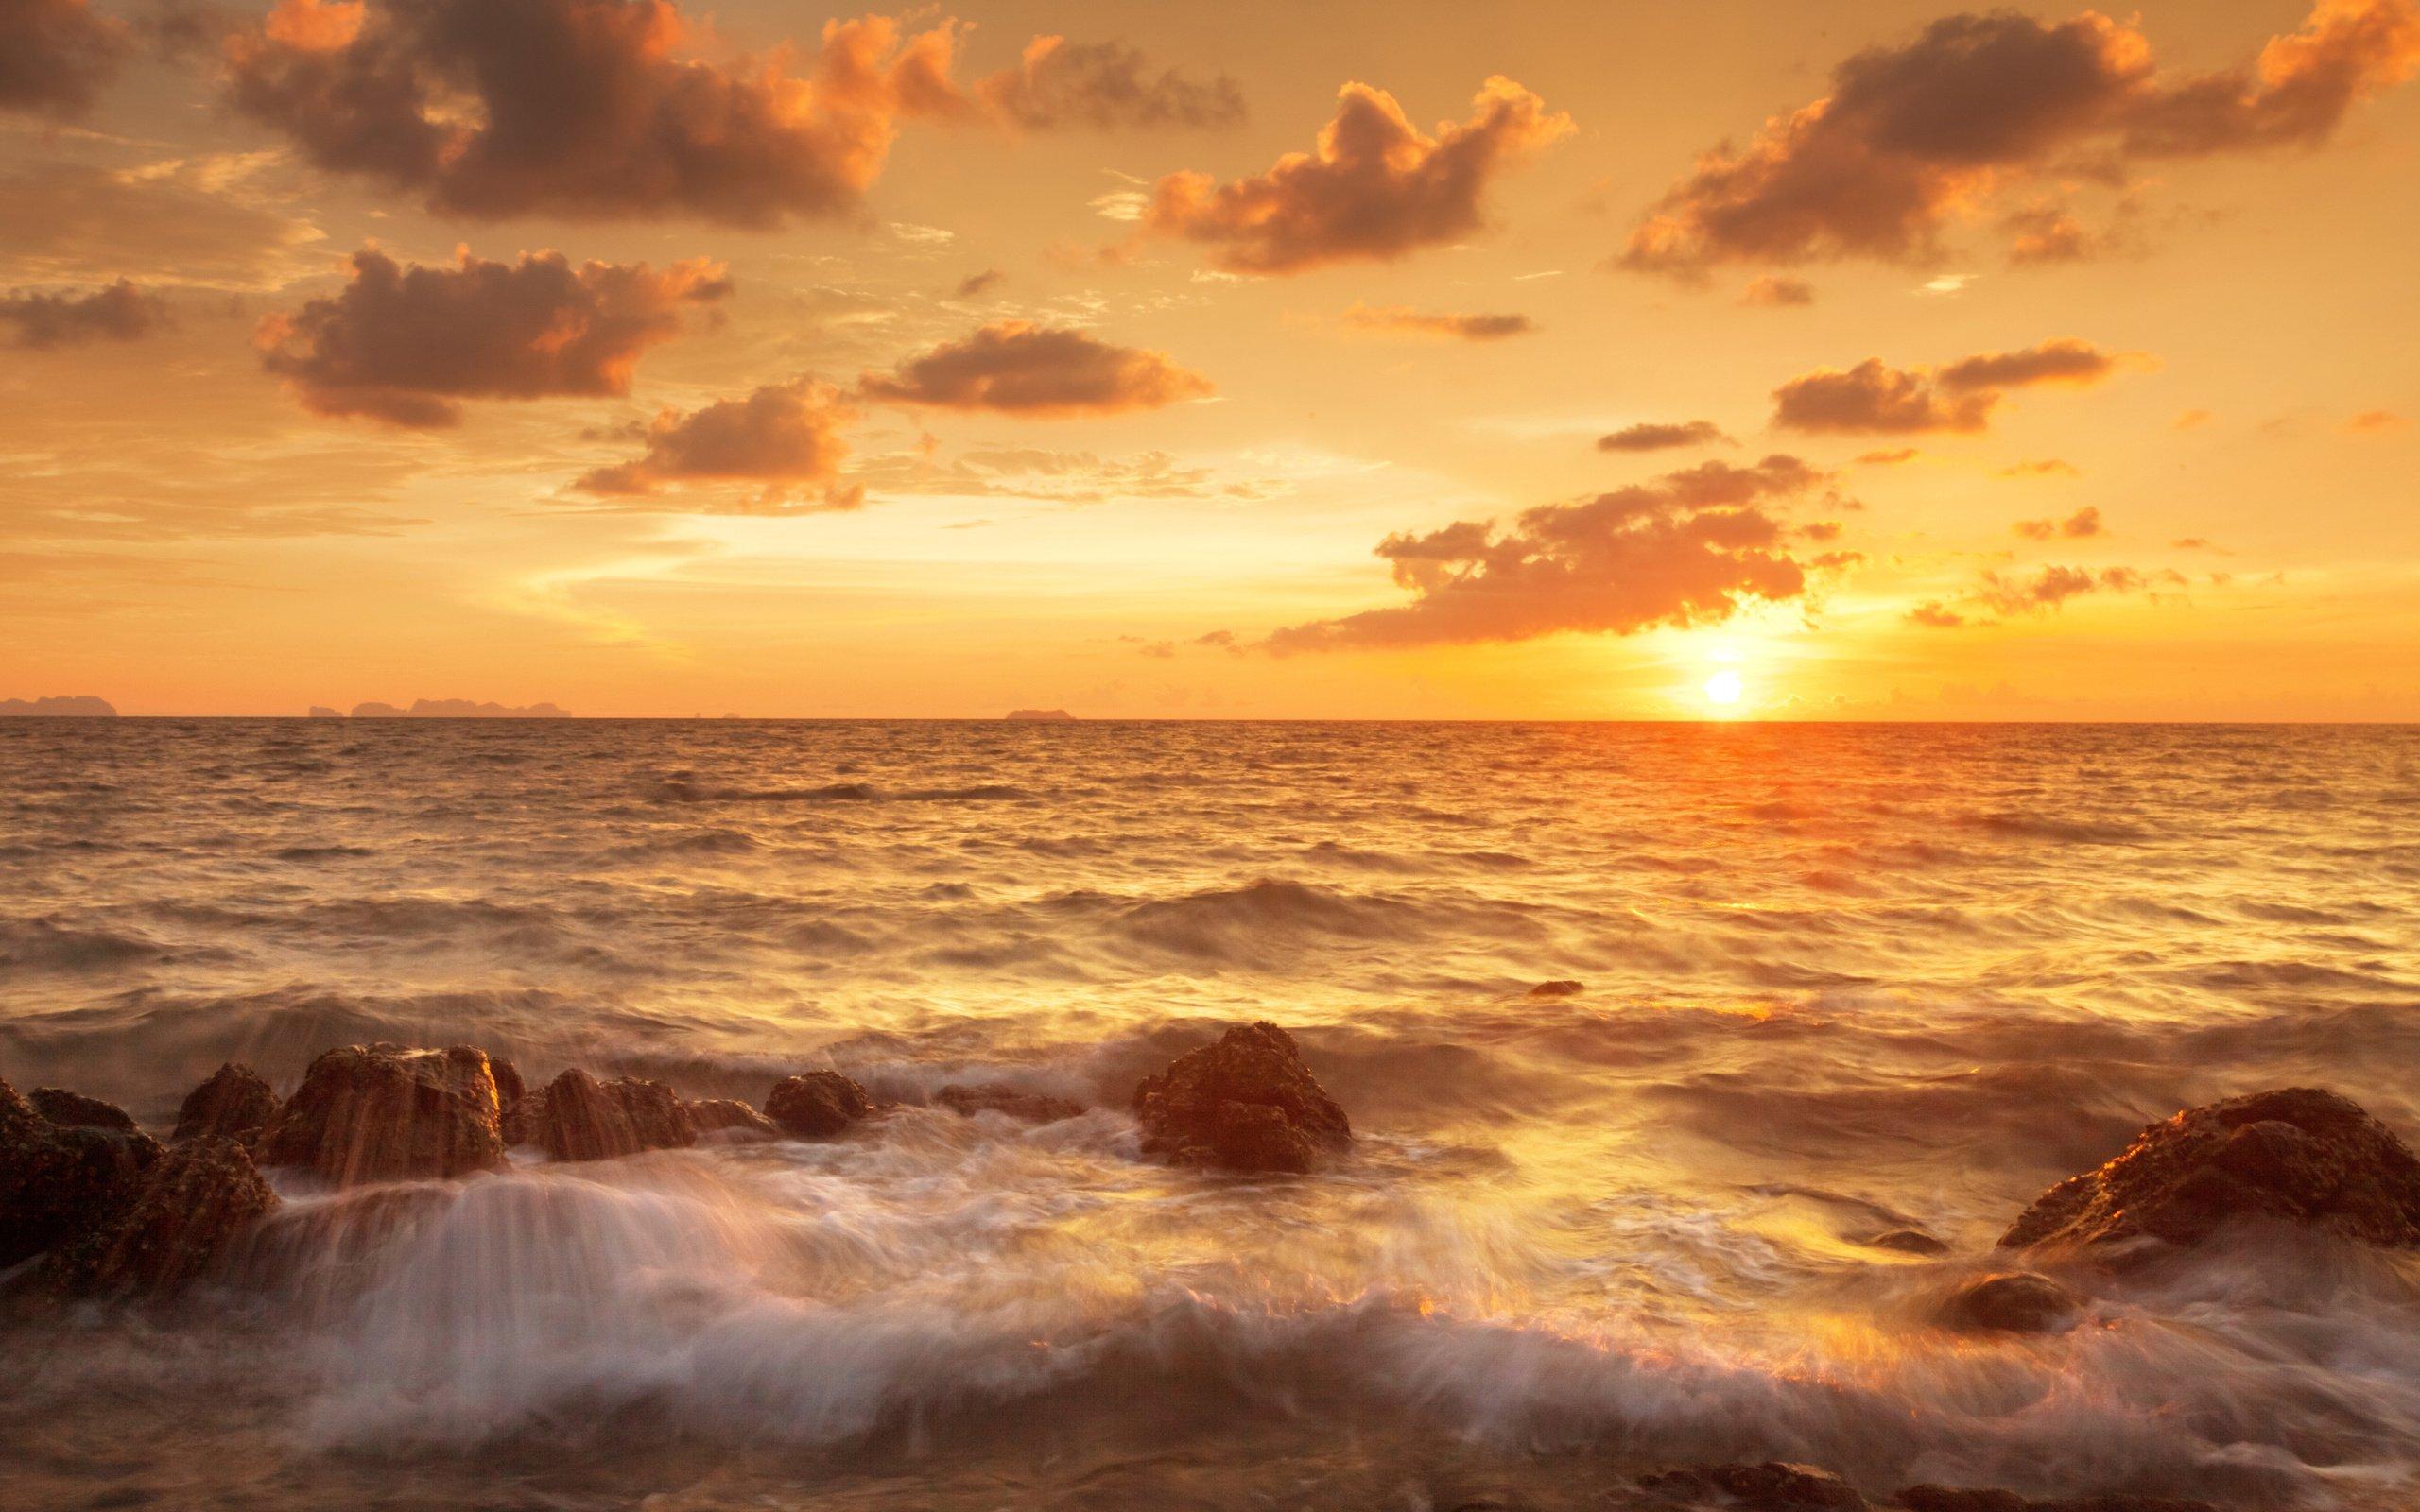 sand sea sky beautiful tropical sunset scene clouds shore